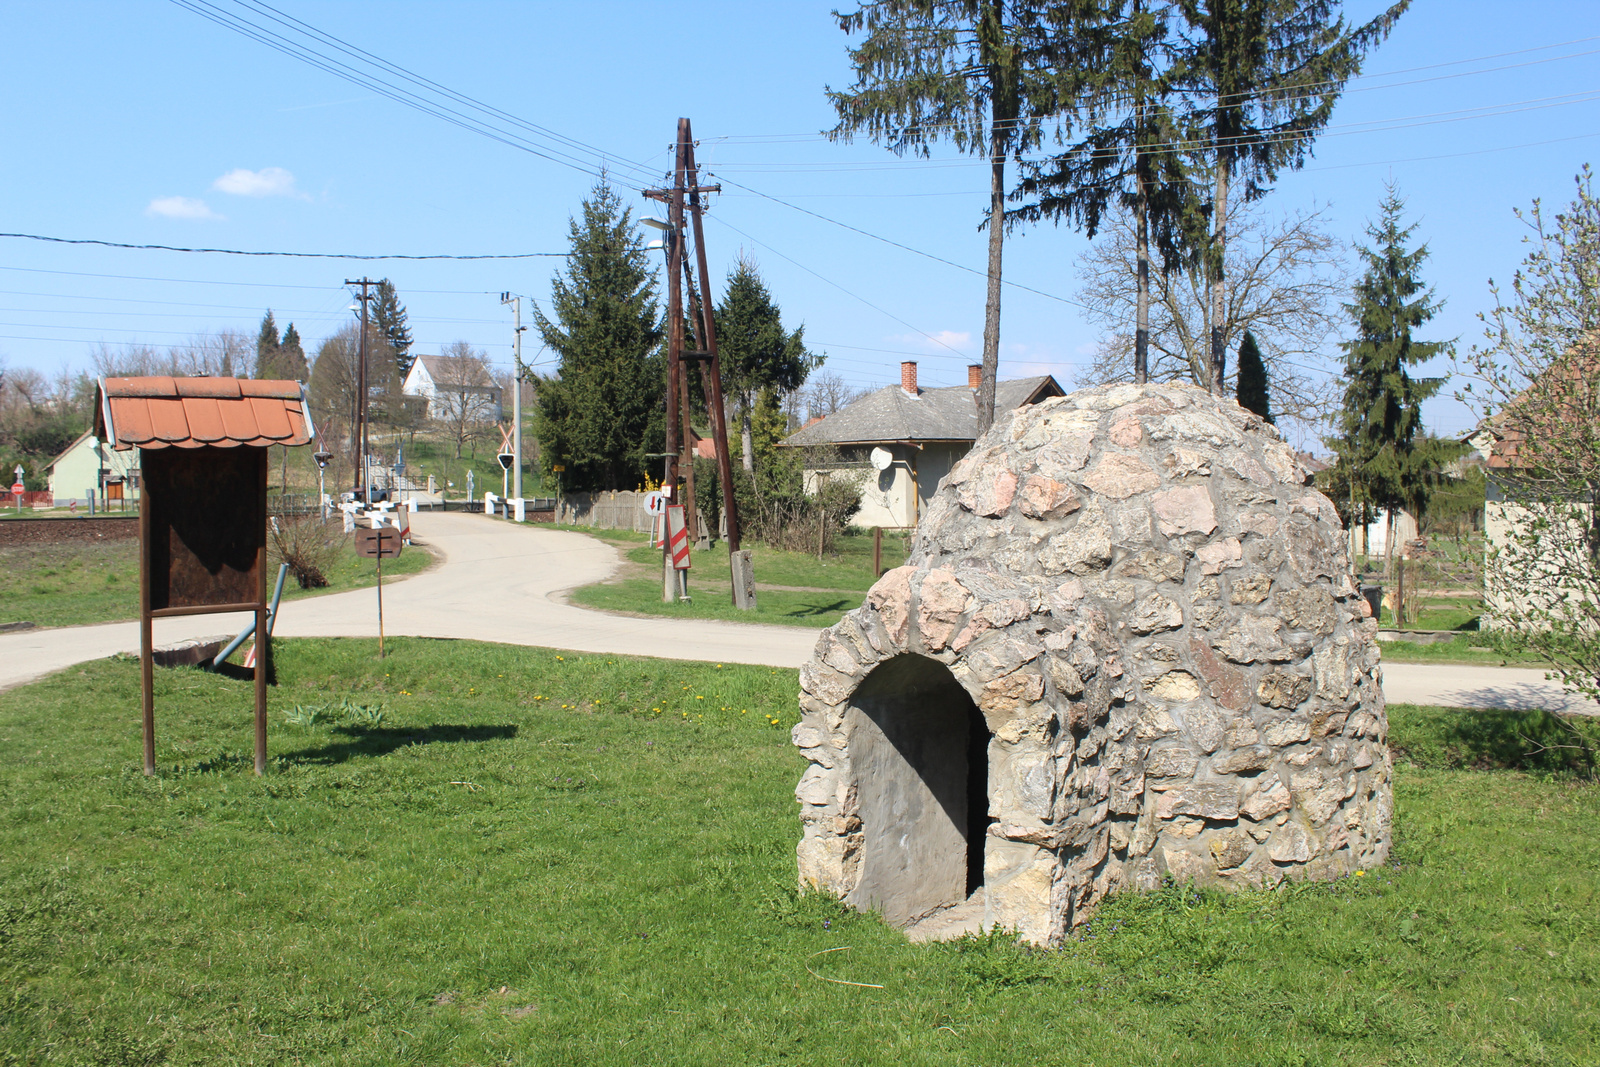 20170402-80-Varoslod-Uveghuta